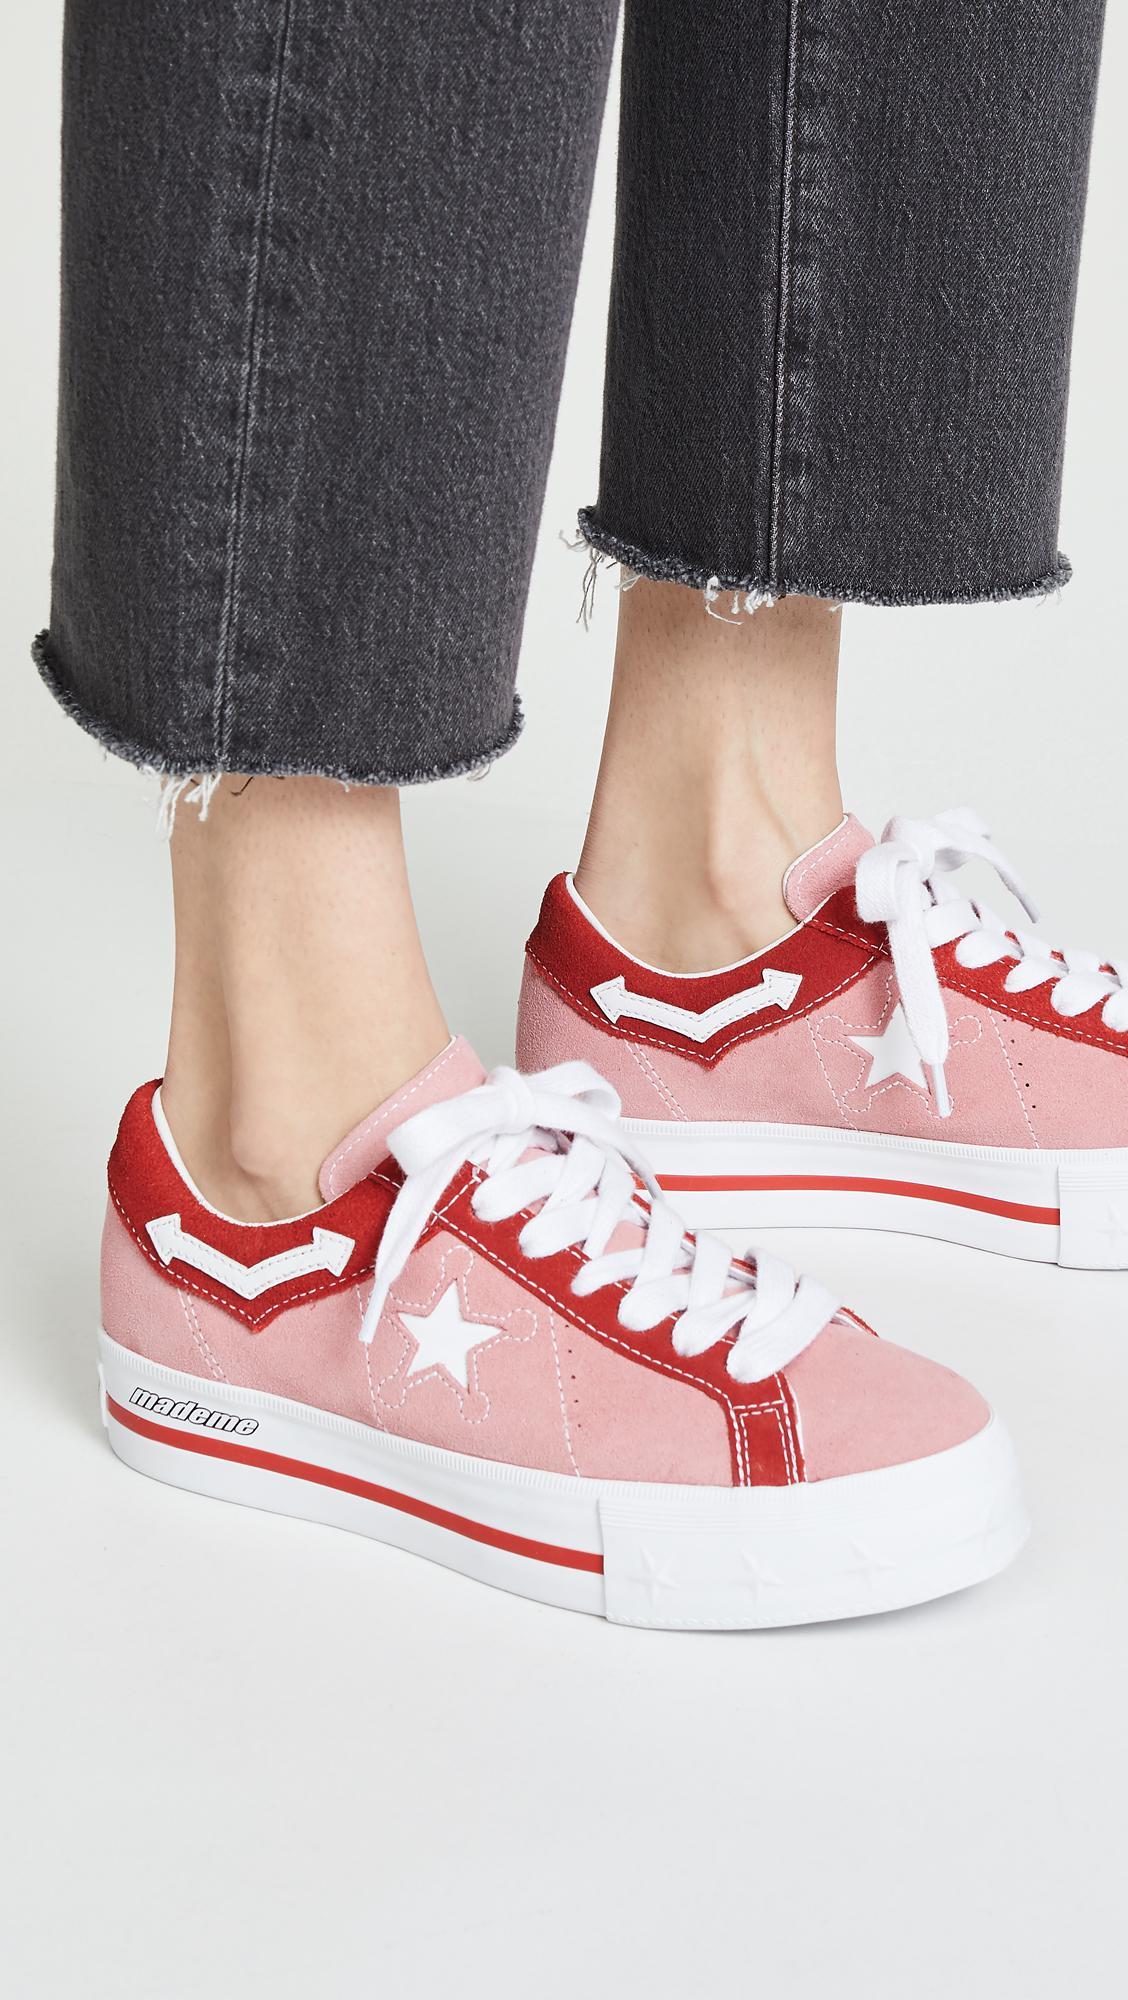 d7e86bcf9e9e1 Converse X Mademe One Star Lift Platform Sneakers in Pink - Lyst